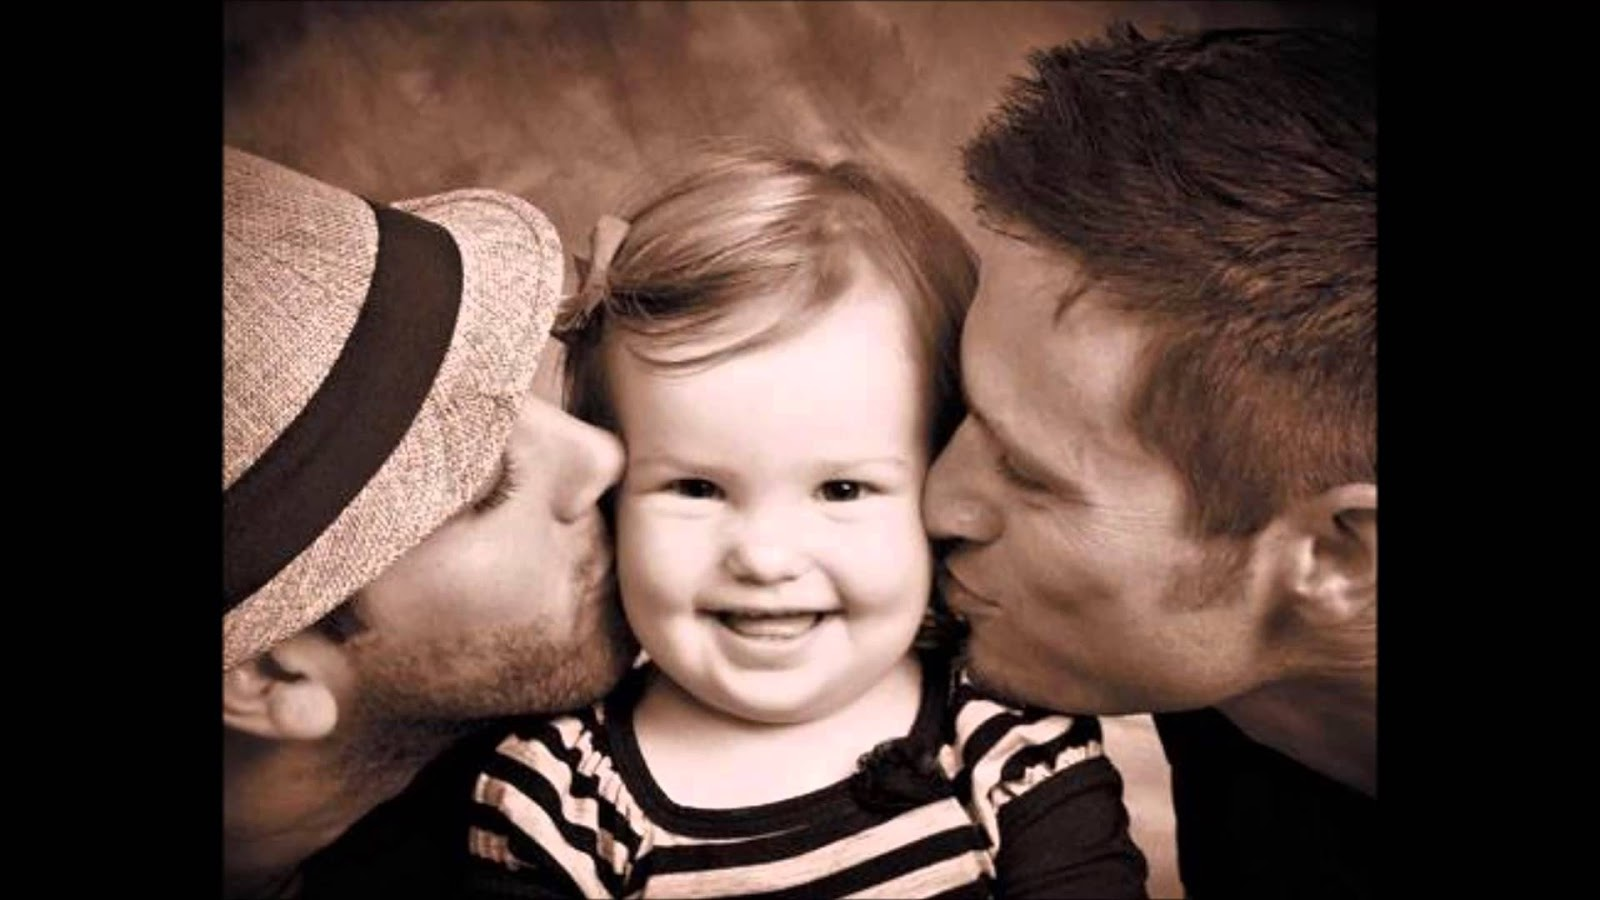 familia adoptiva comidos homosexuales